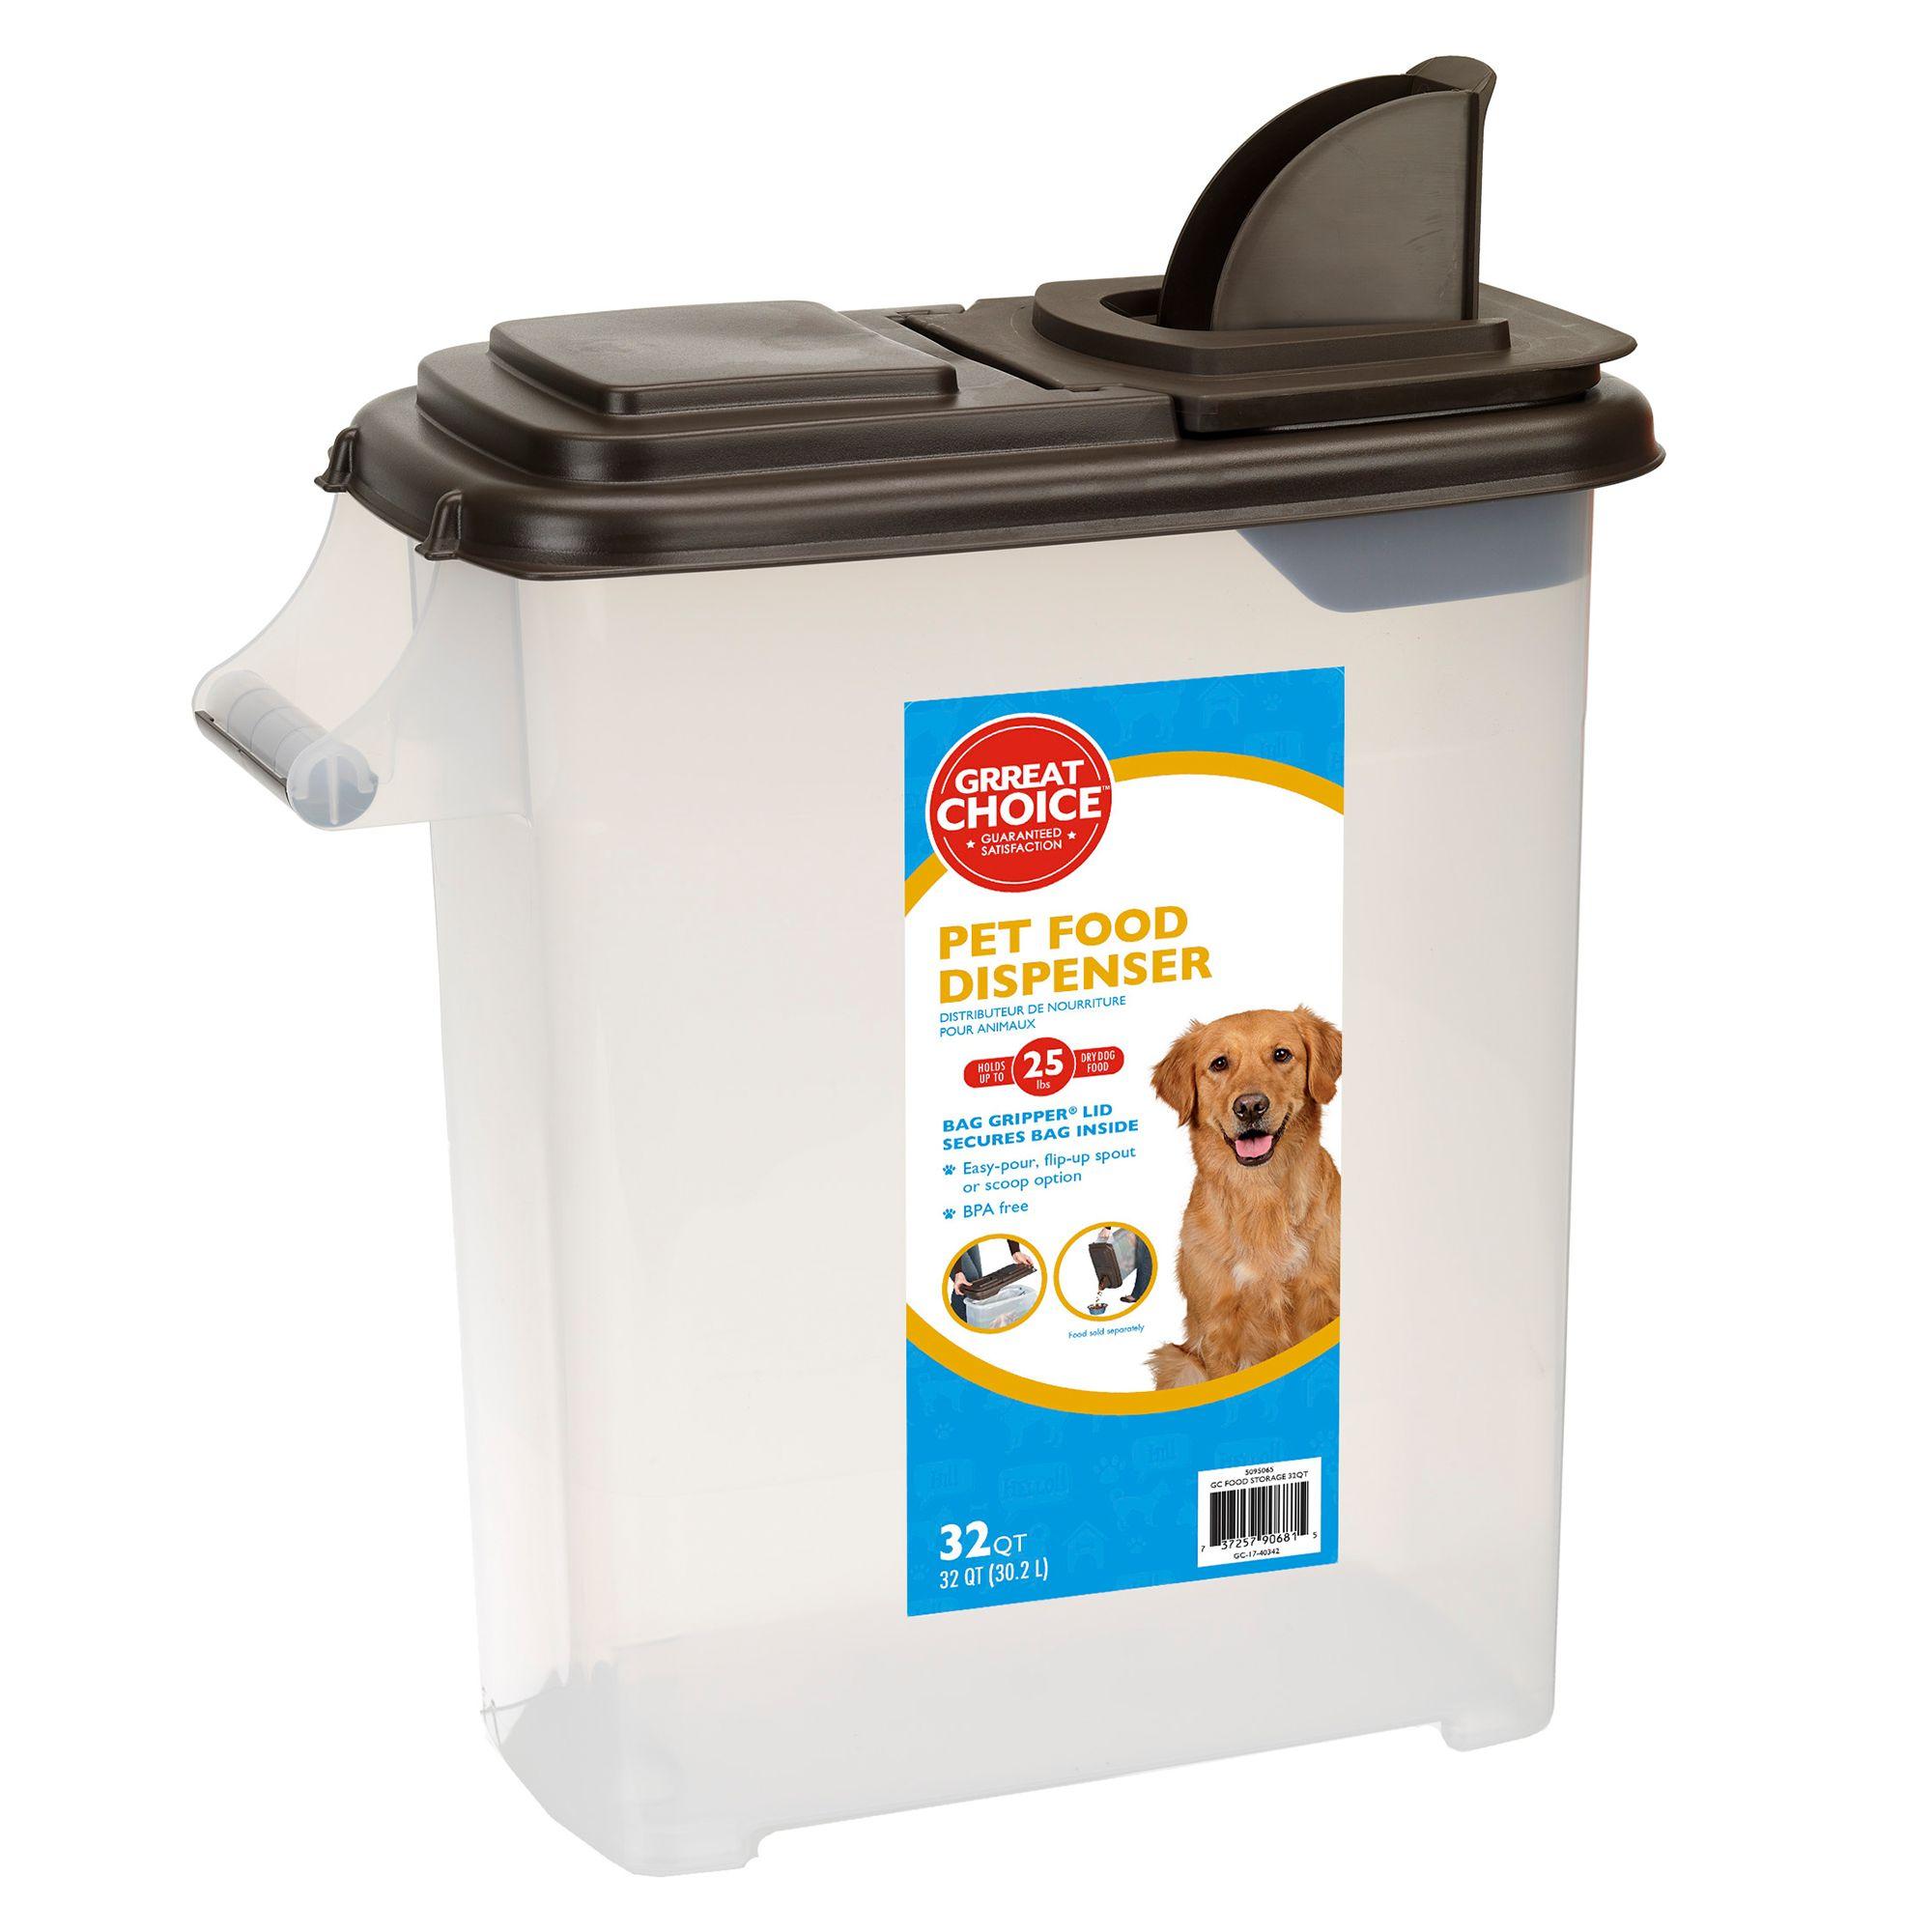 Top Paw Pet Food Storage And Dispenser Size 32 Qt Grreat Choice